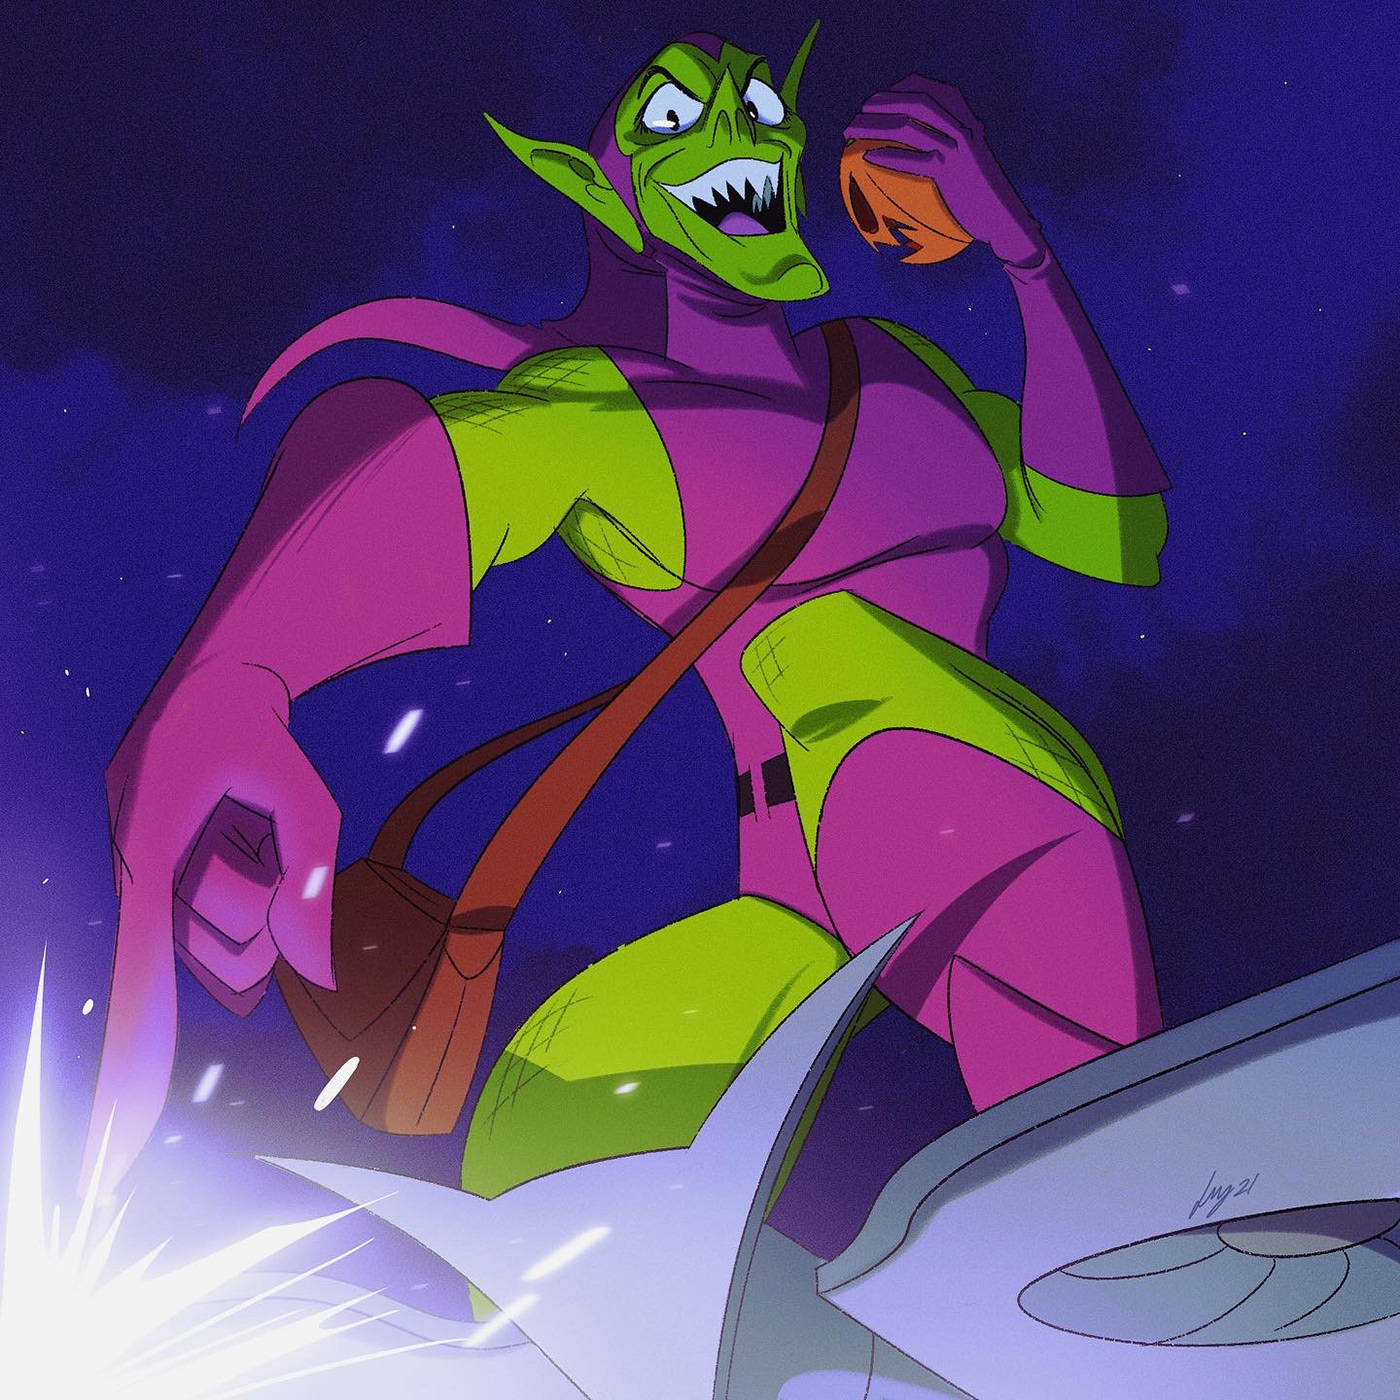 art Character design  electro fanart Green Goblin hammerhead hobgoblin ILLUSTRATION  kingpin kraven marvel mysterio sandman spiderman venom vulture